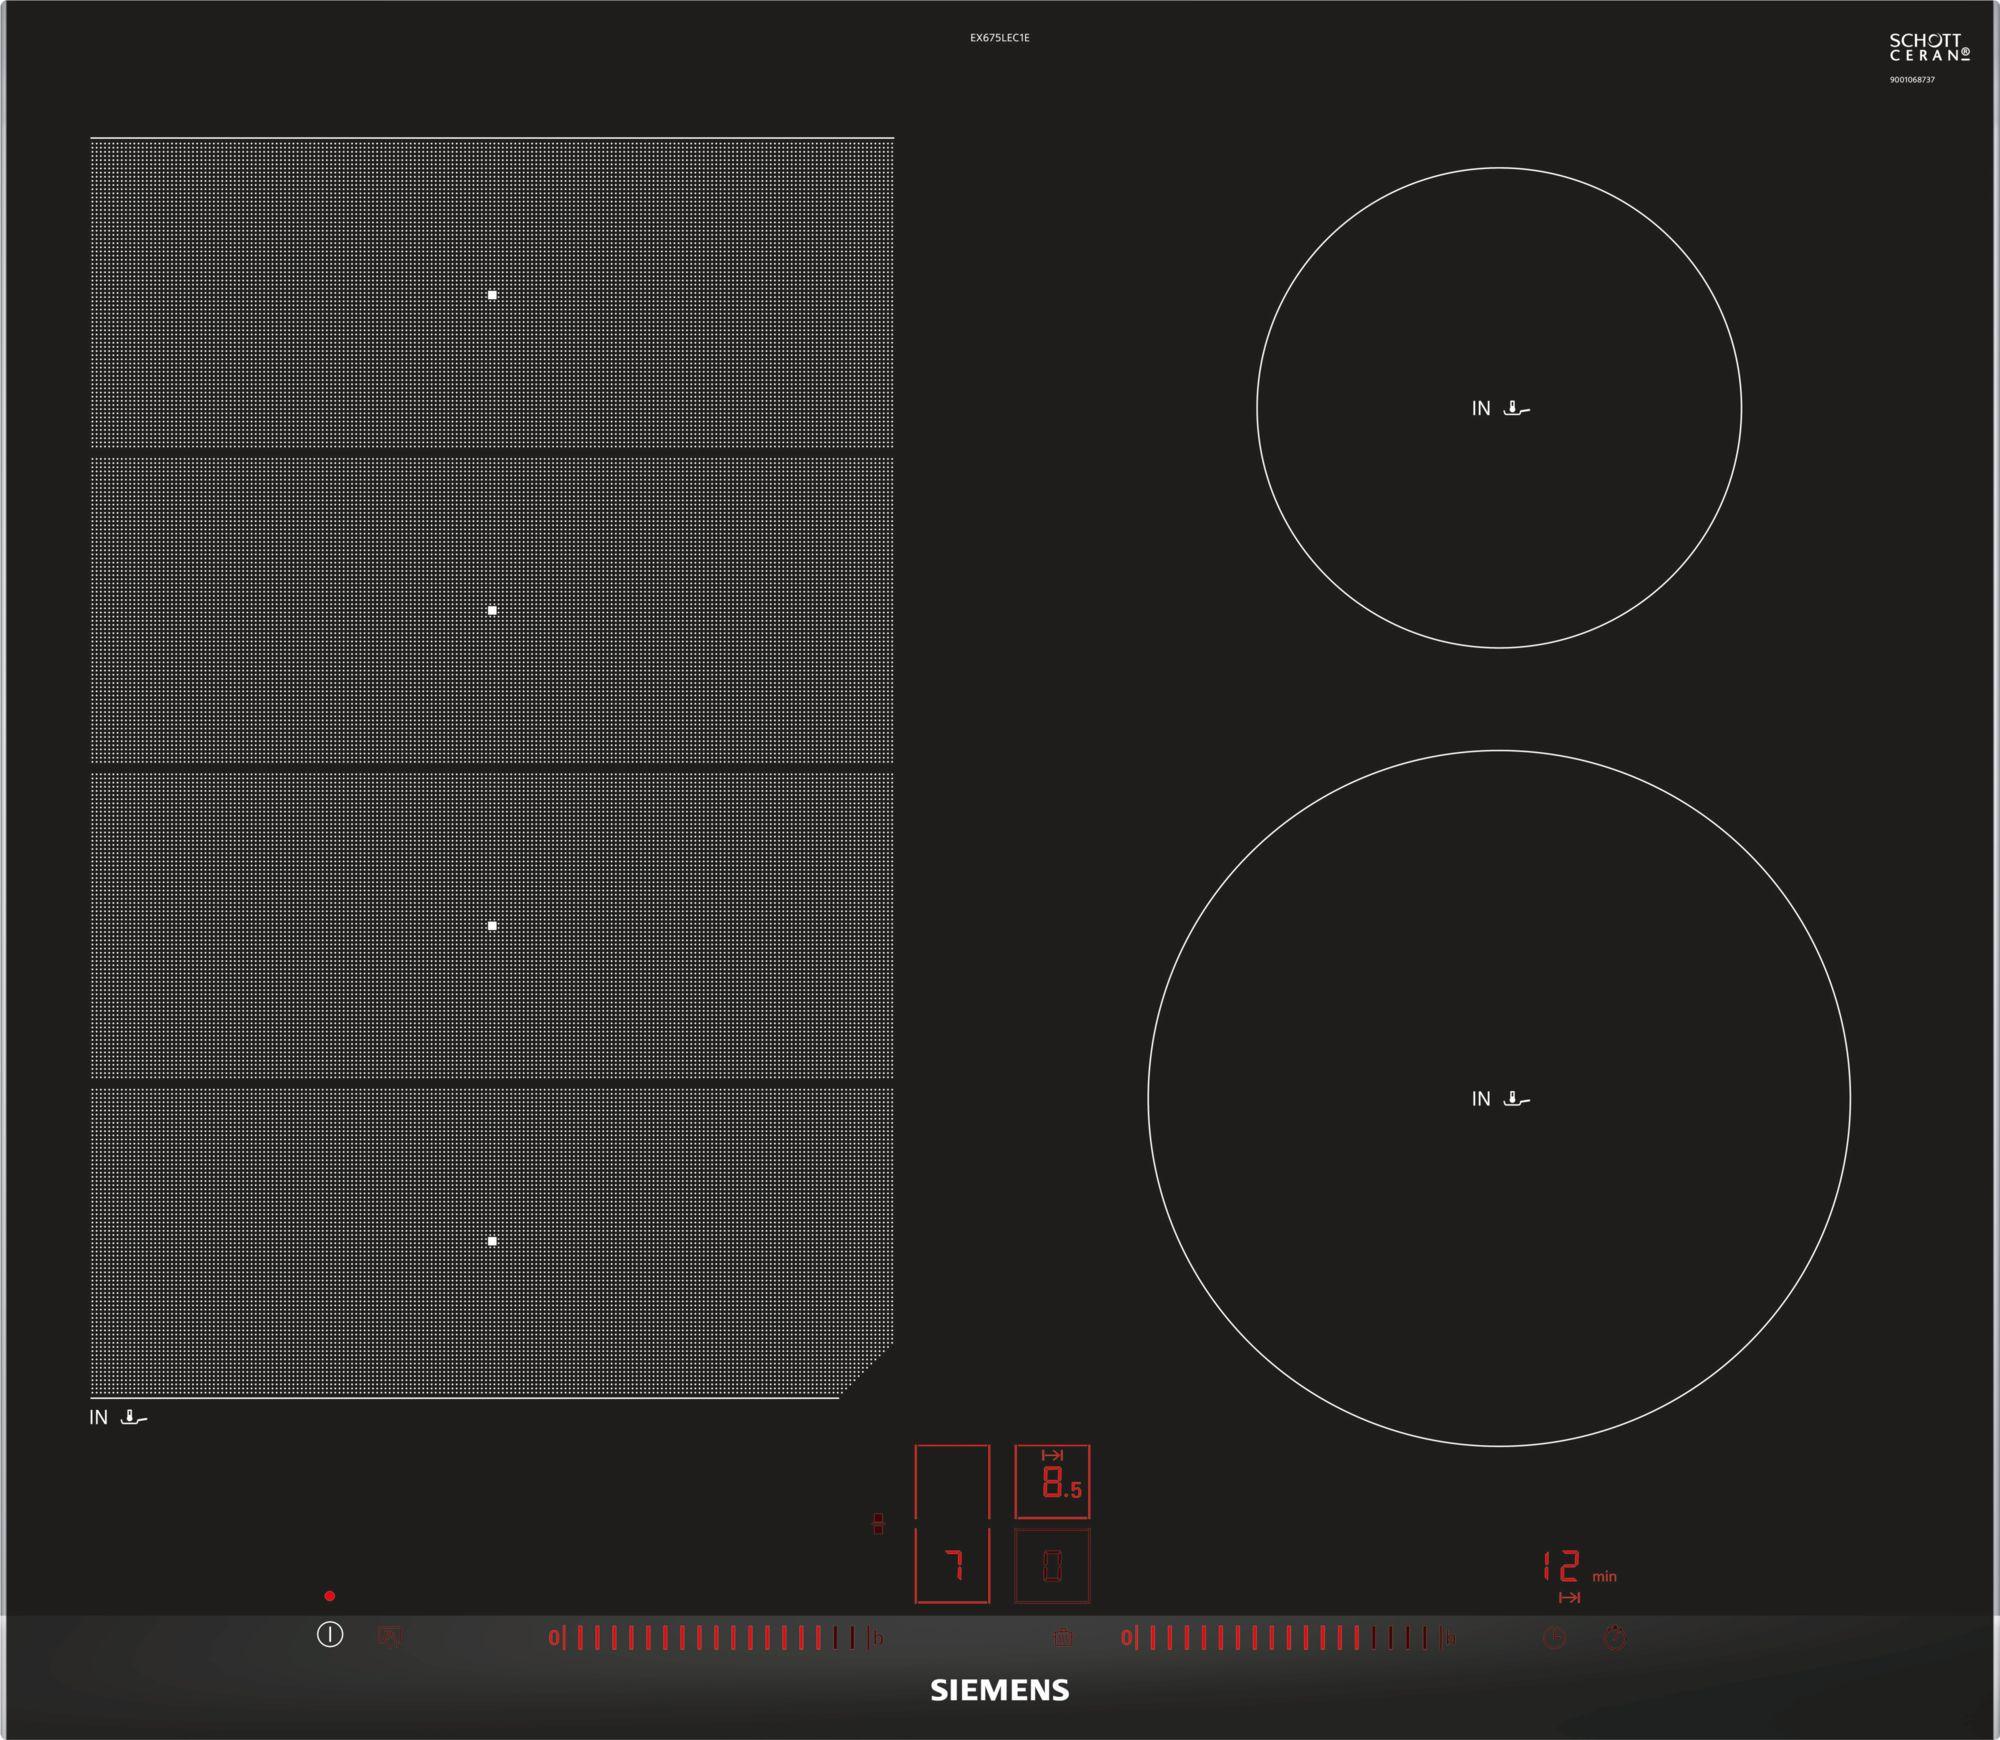 Piano cottura ad induzione 60 cm Siemens - EX675LEC1E - Logica snc